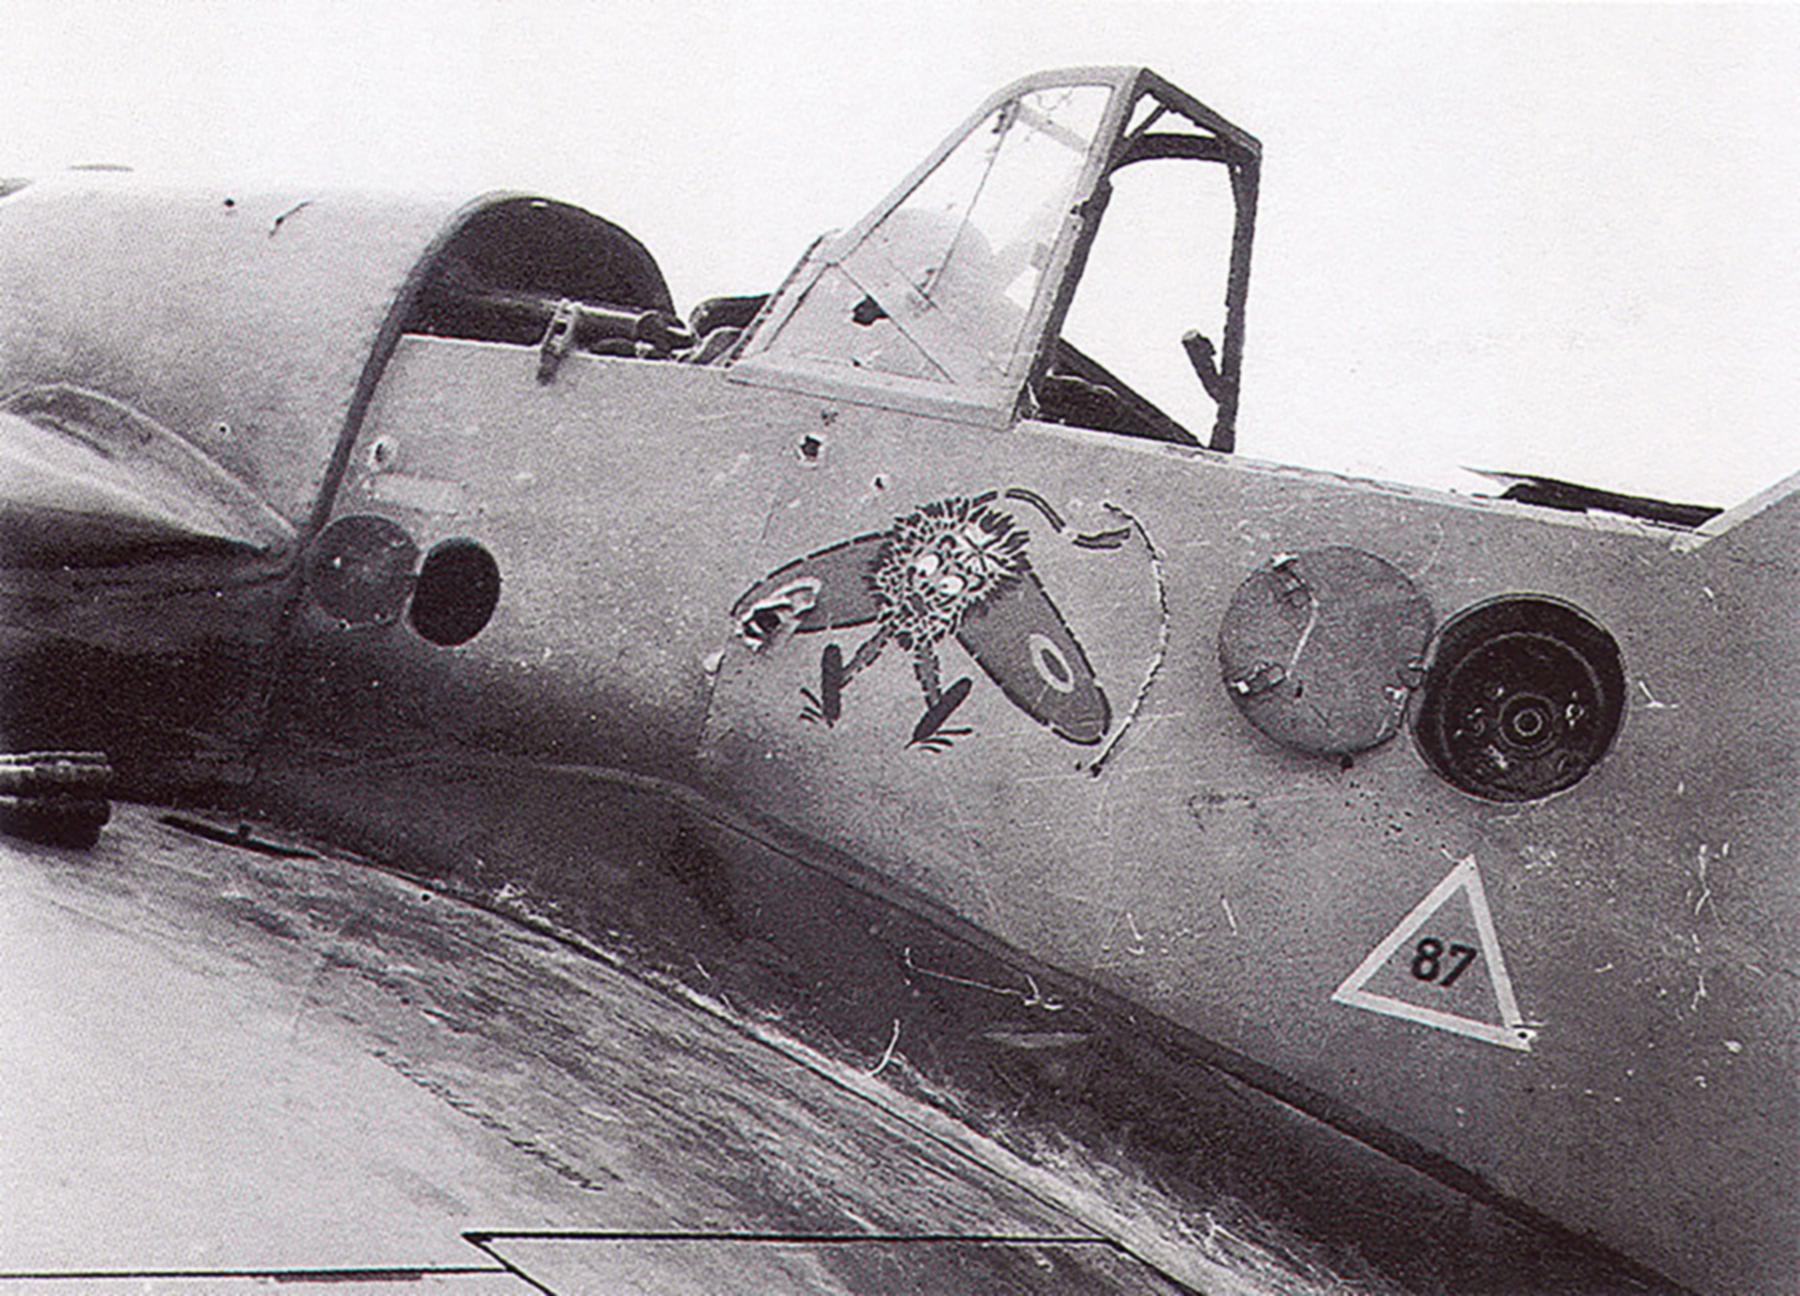 Messerschmitt Bf 109F4Trop 4.JG27 White 12 WNr 8438 El Gazala Dec 1941 02